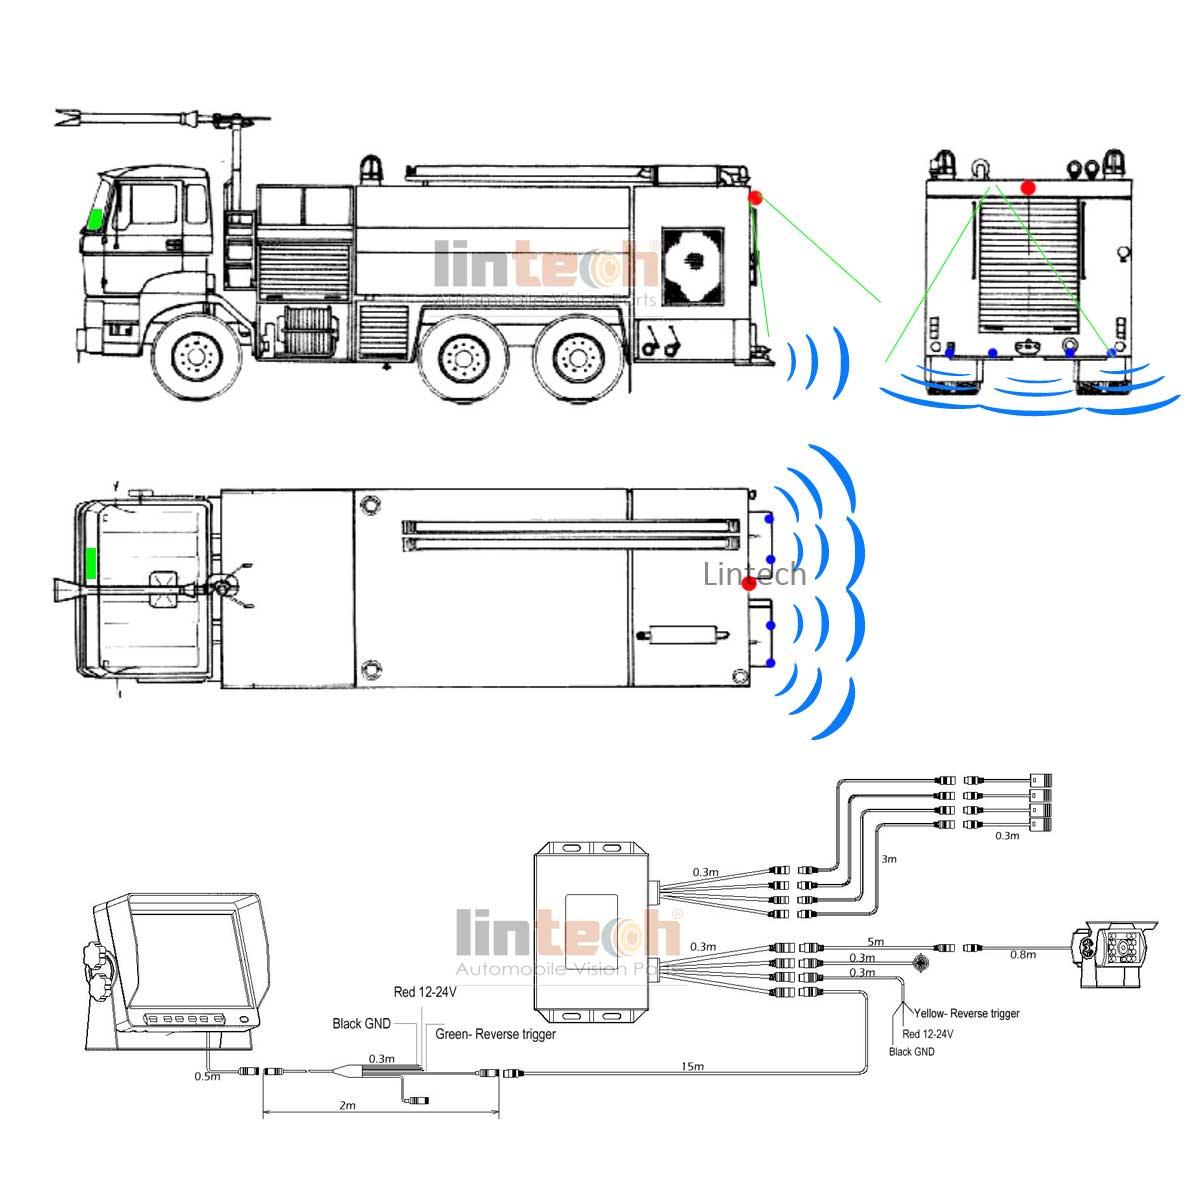 fire truck wiring diagram